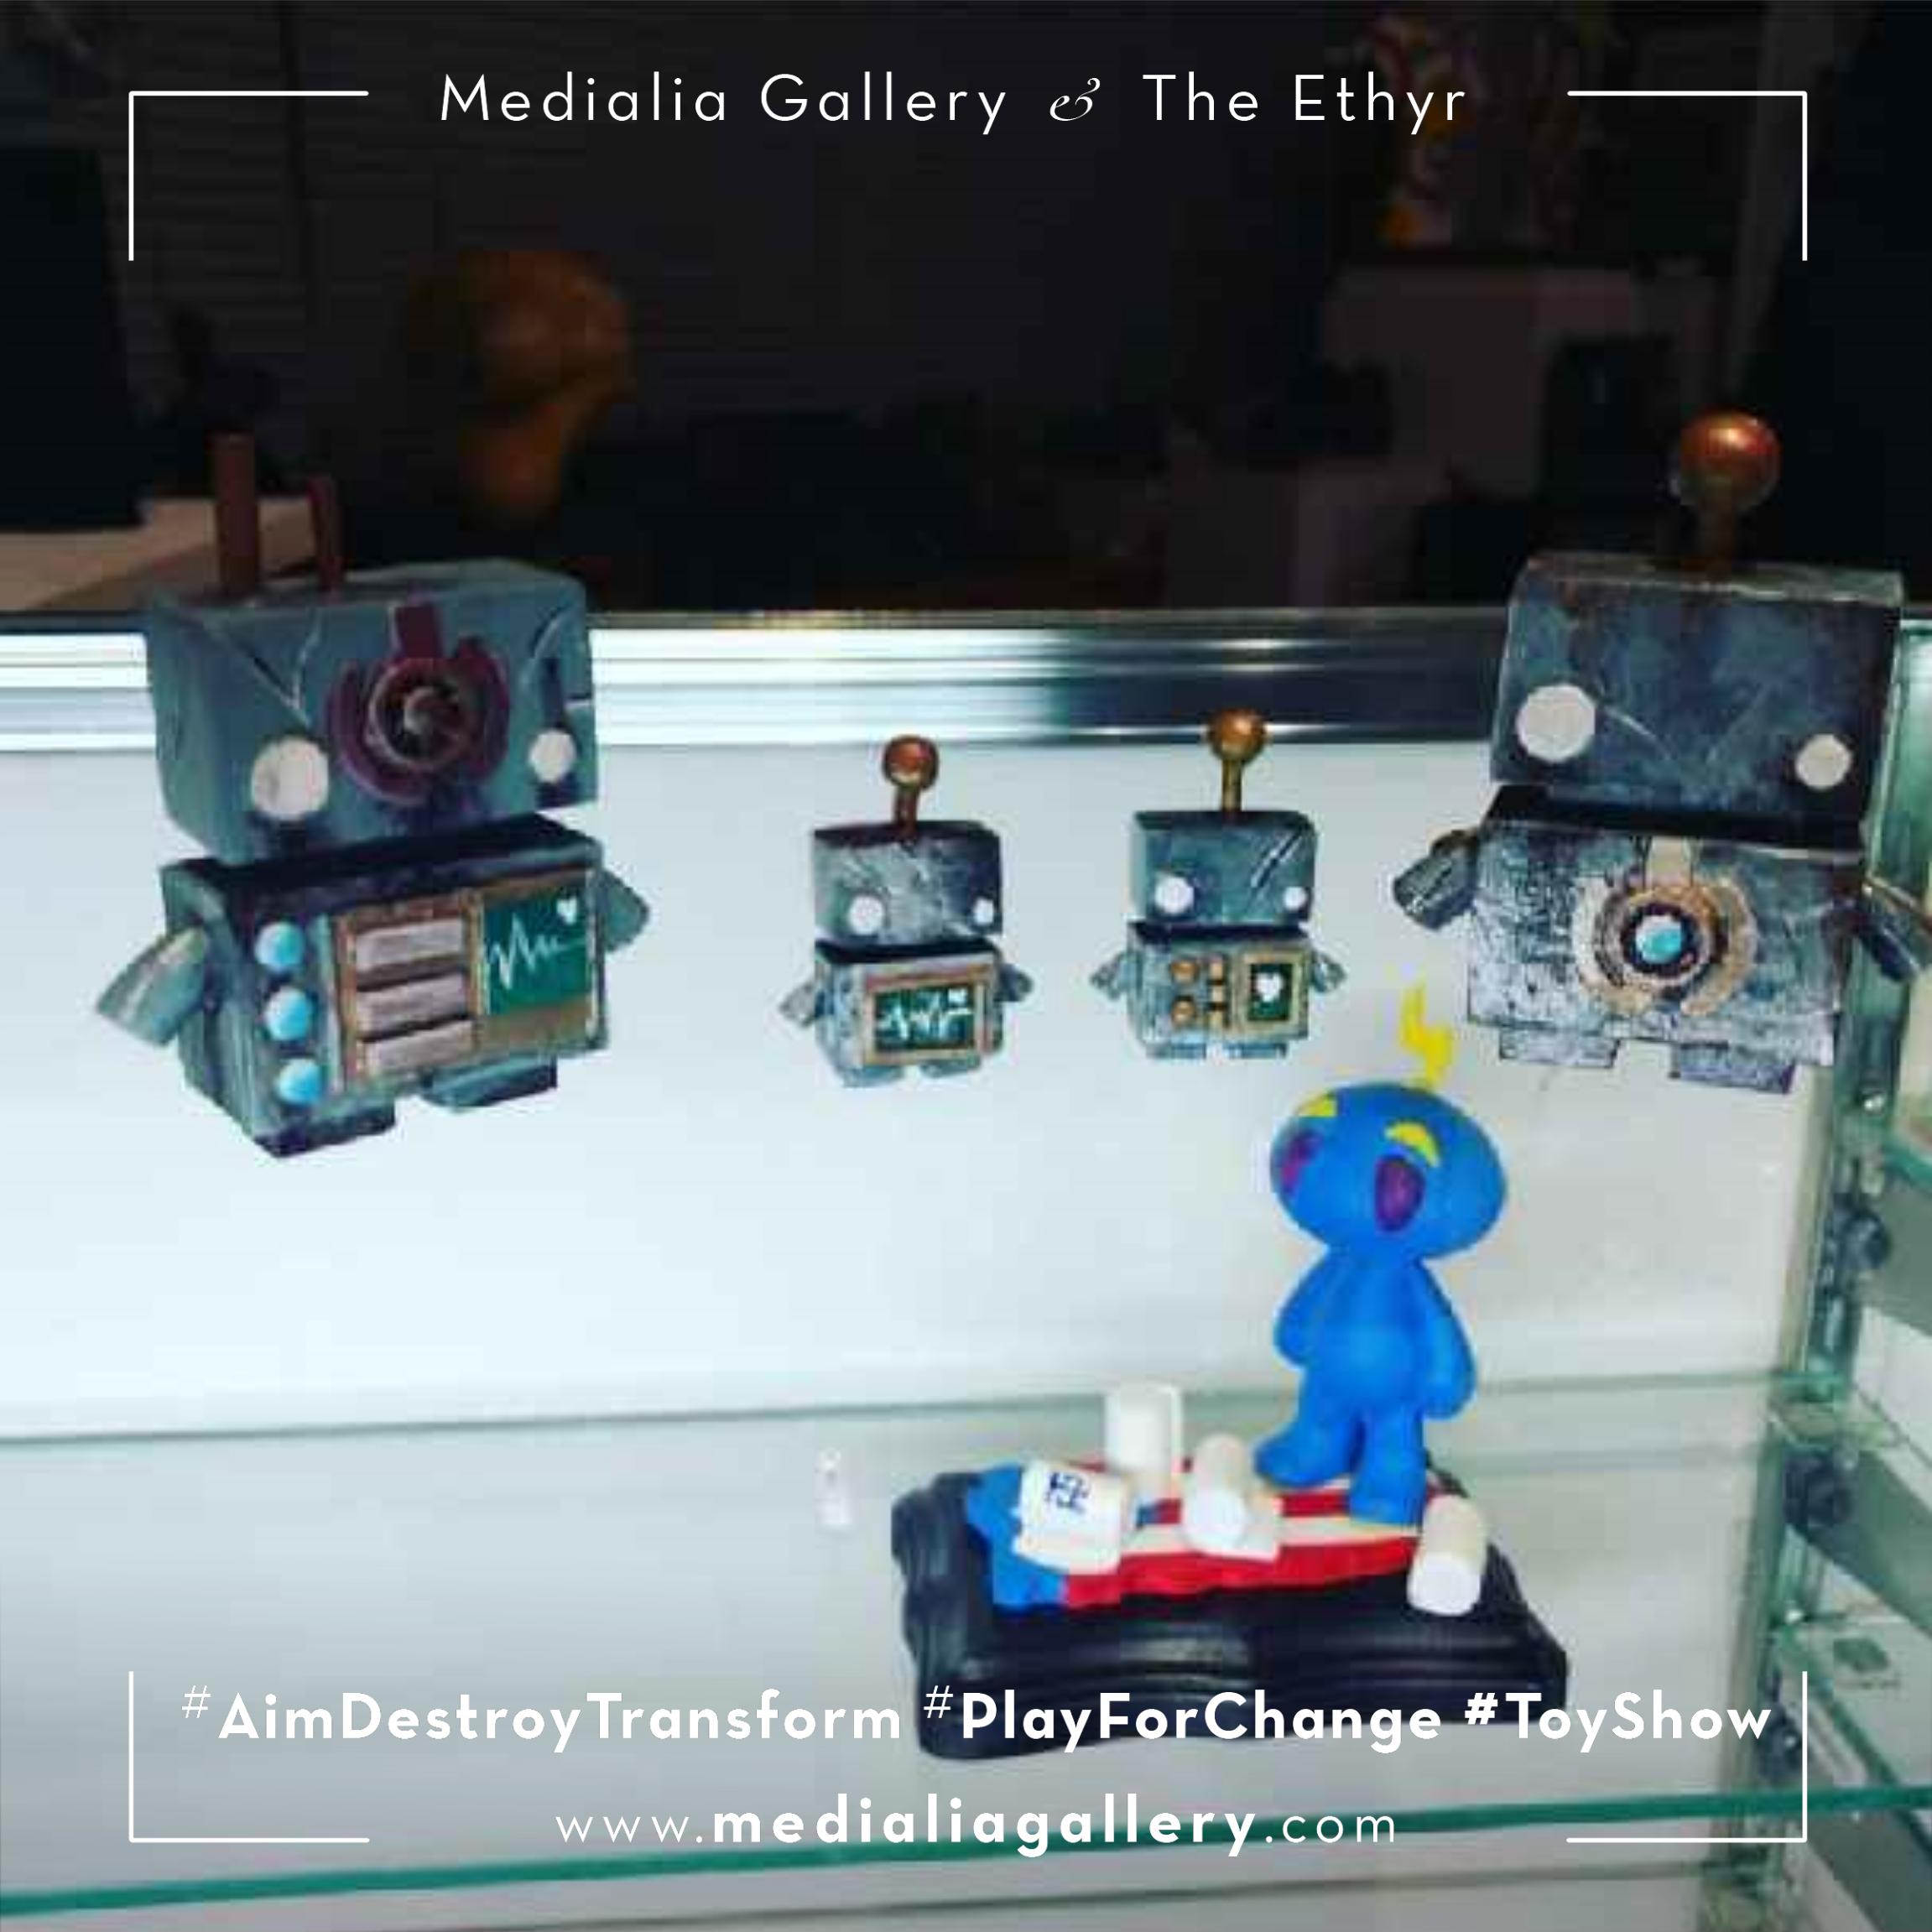 MedialiaGallery_The_Ethyr_AimDestroyTransform_Toy_Show_announcement_Showcase_III_November_2017.jpg.png